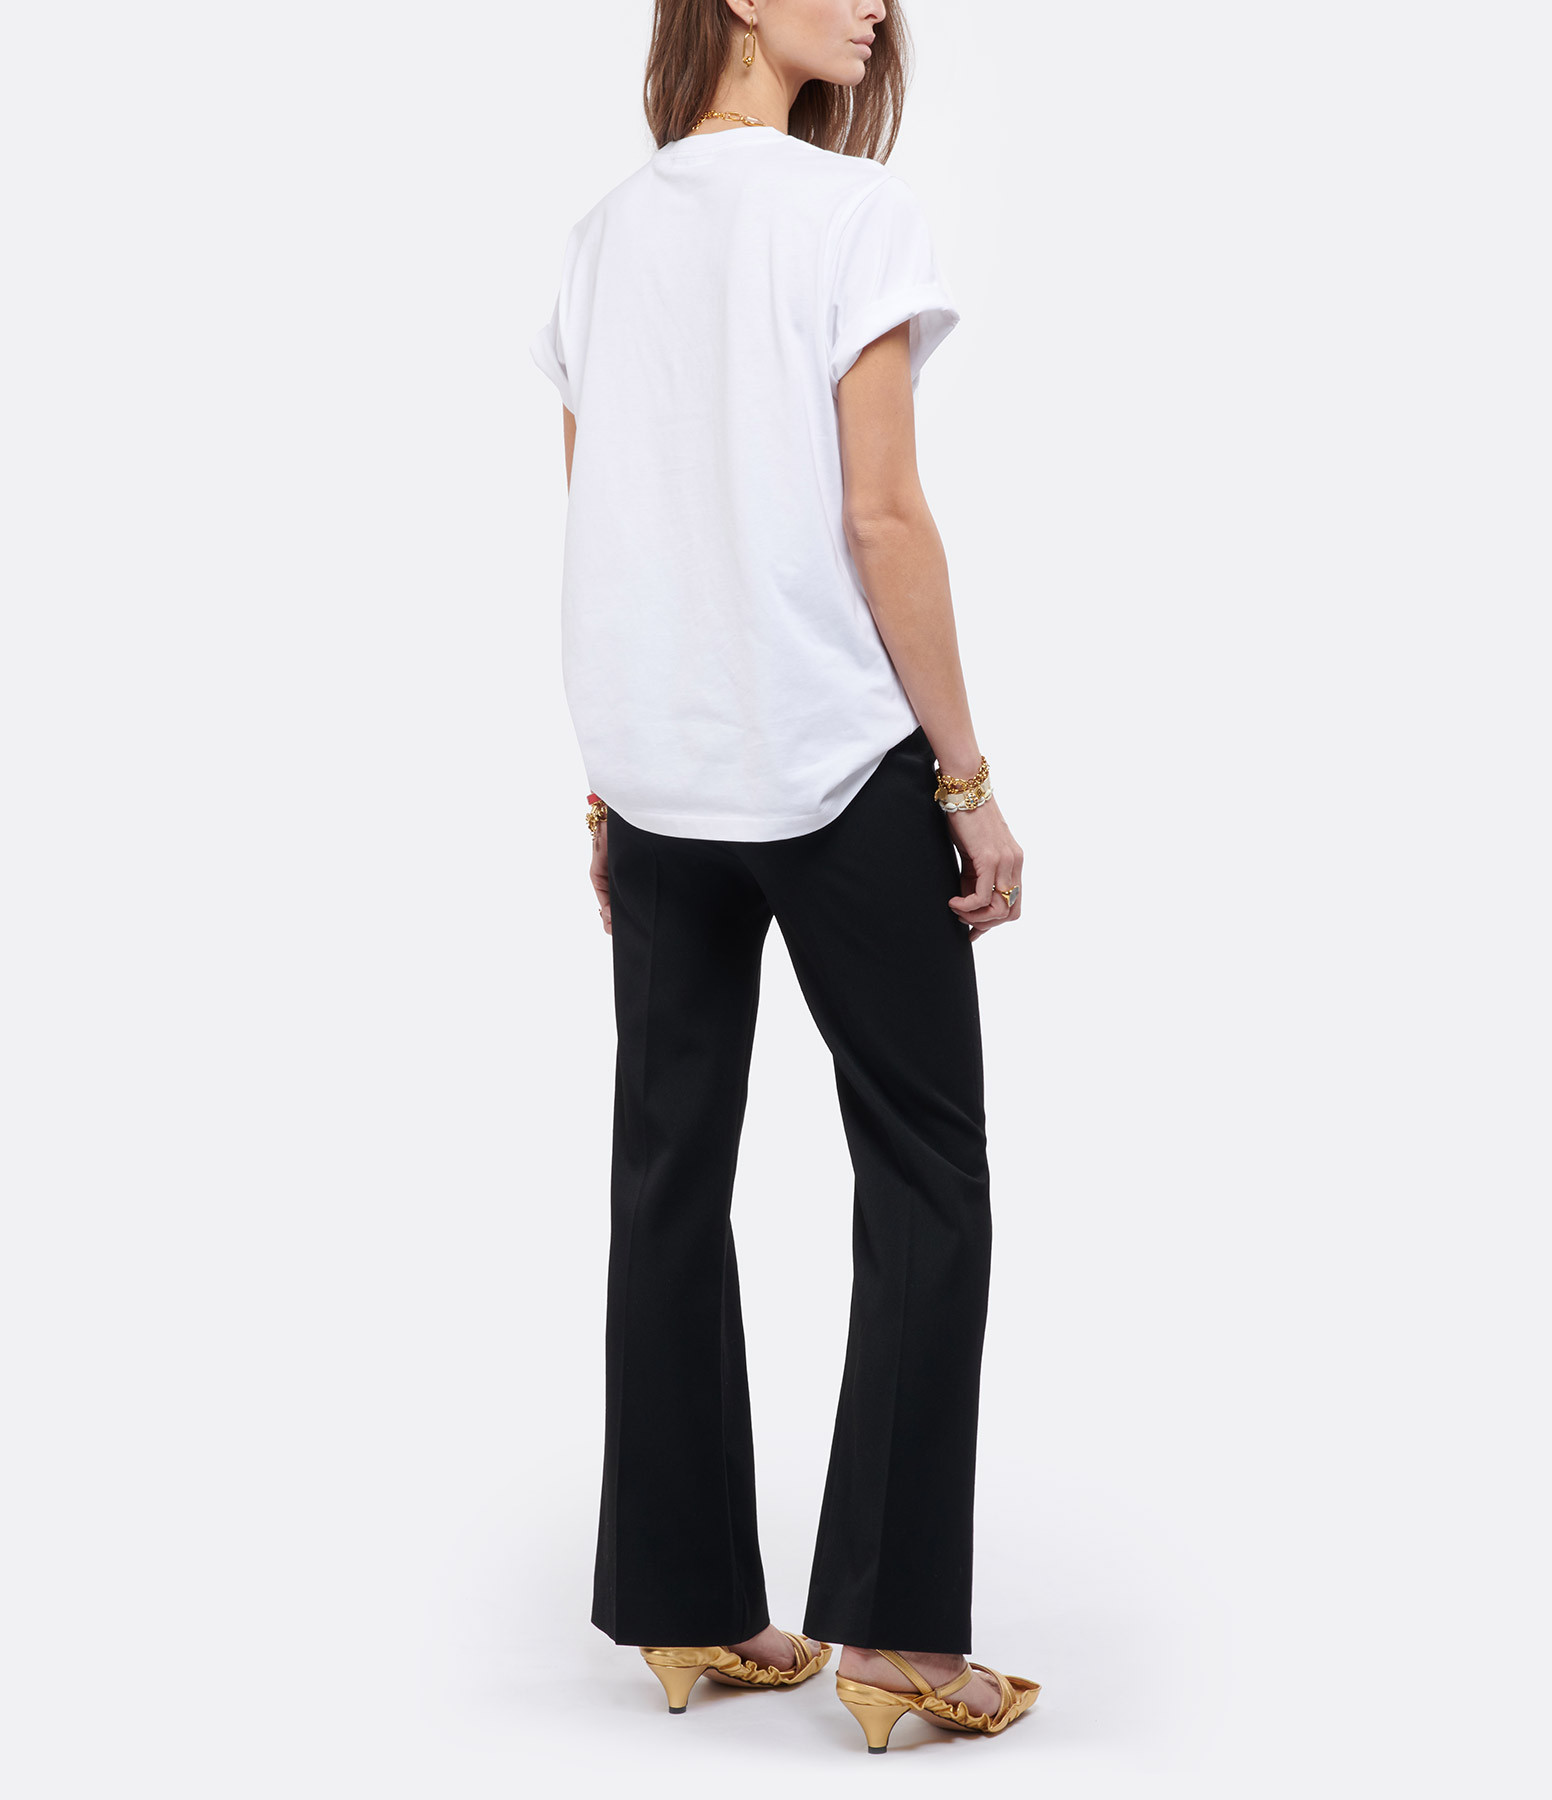 GANNI - Tee-shirt Ganni Coton Biologique Blanc Jaune